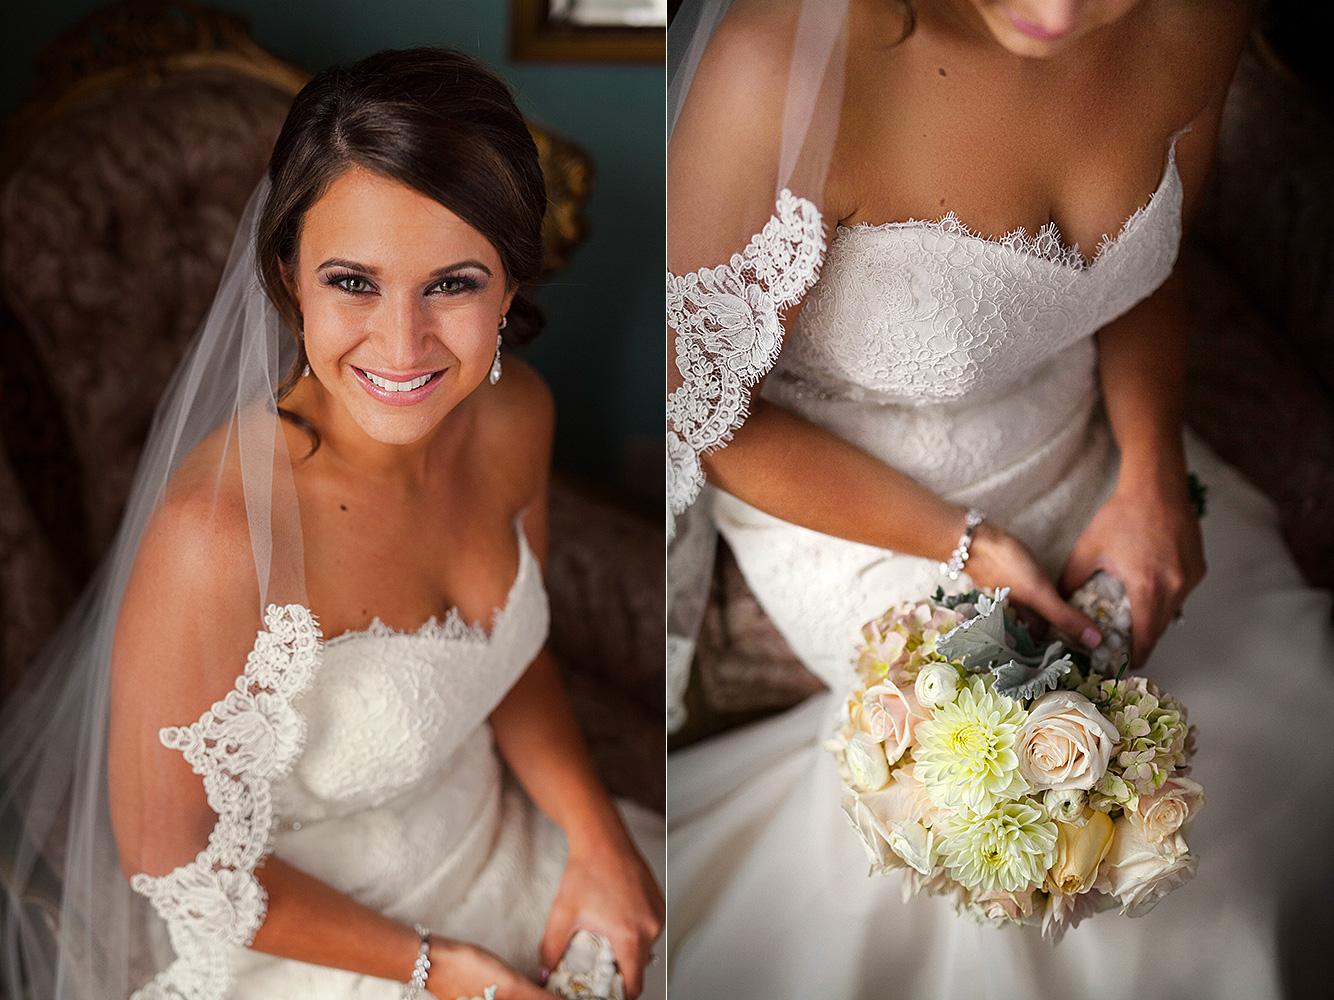 NY_Wedding_Photographer_AsEr_14.jpg